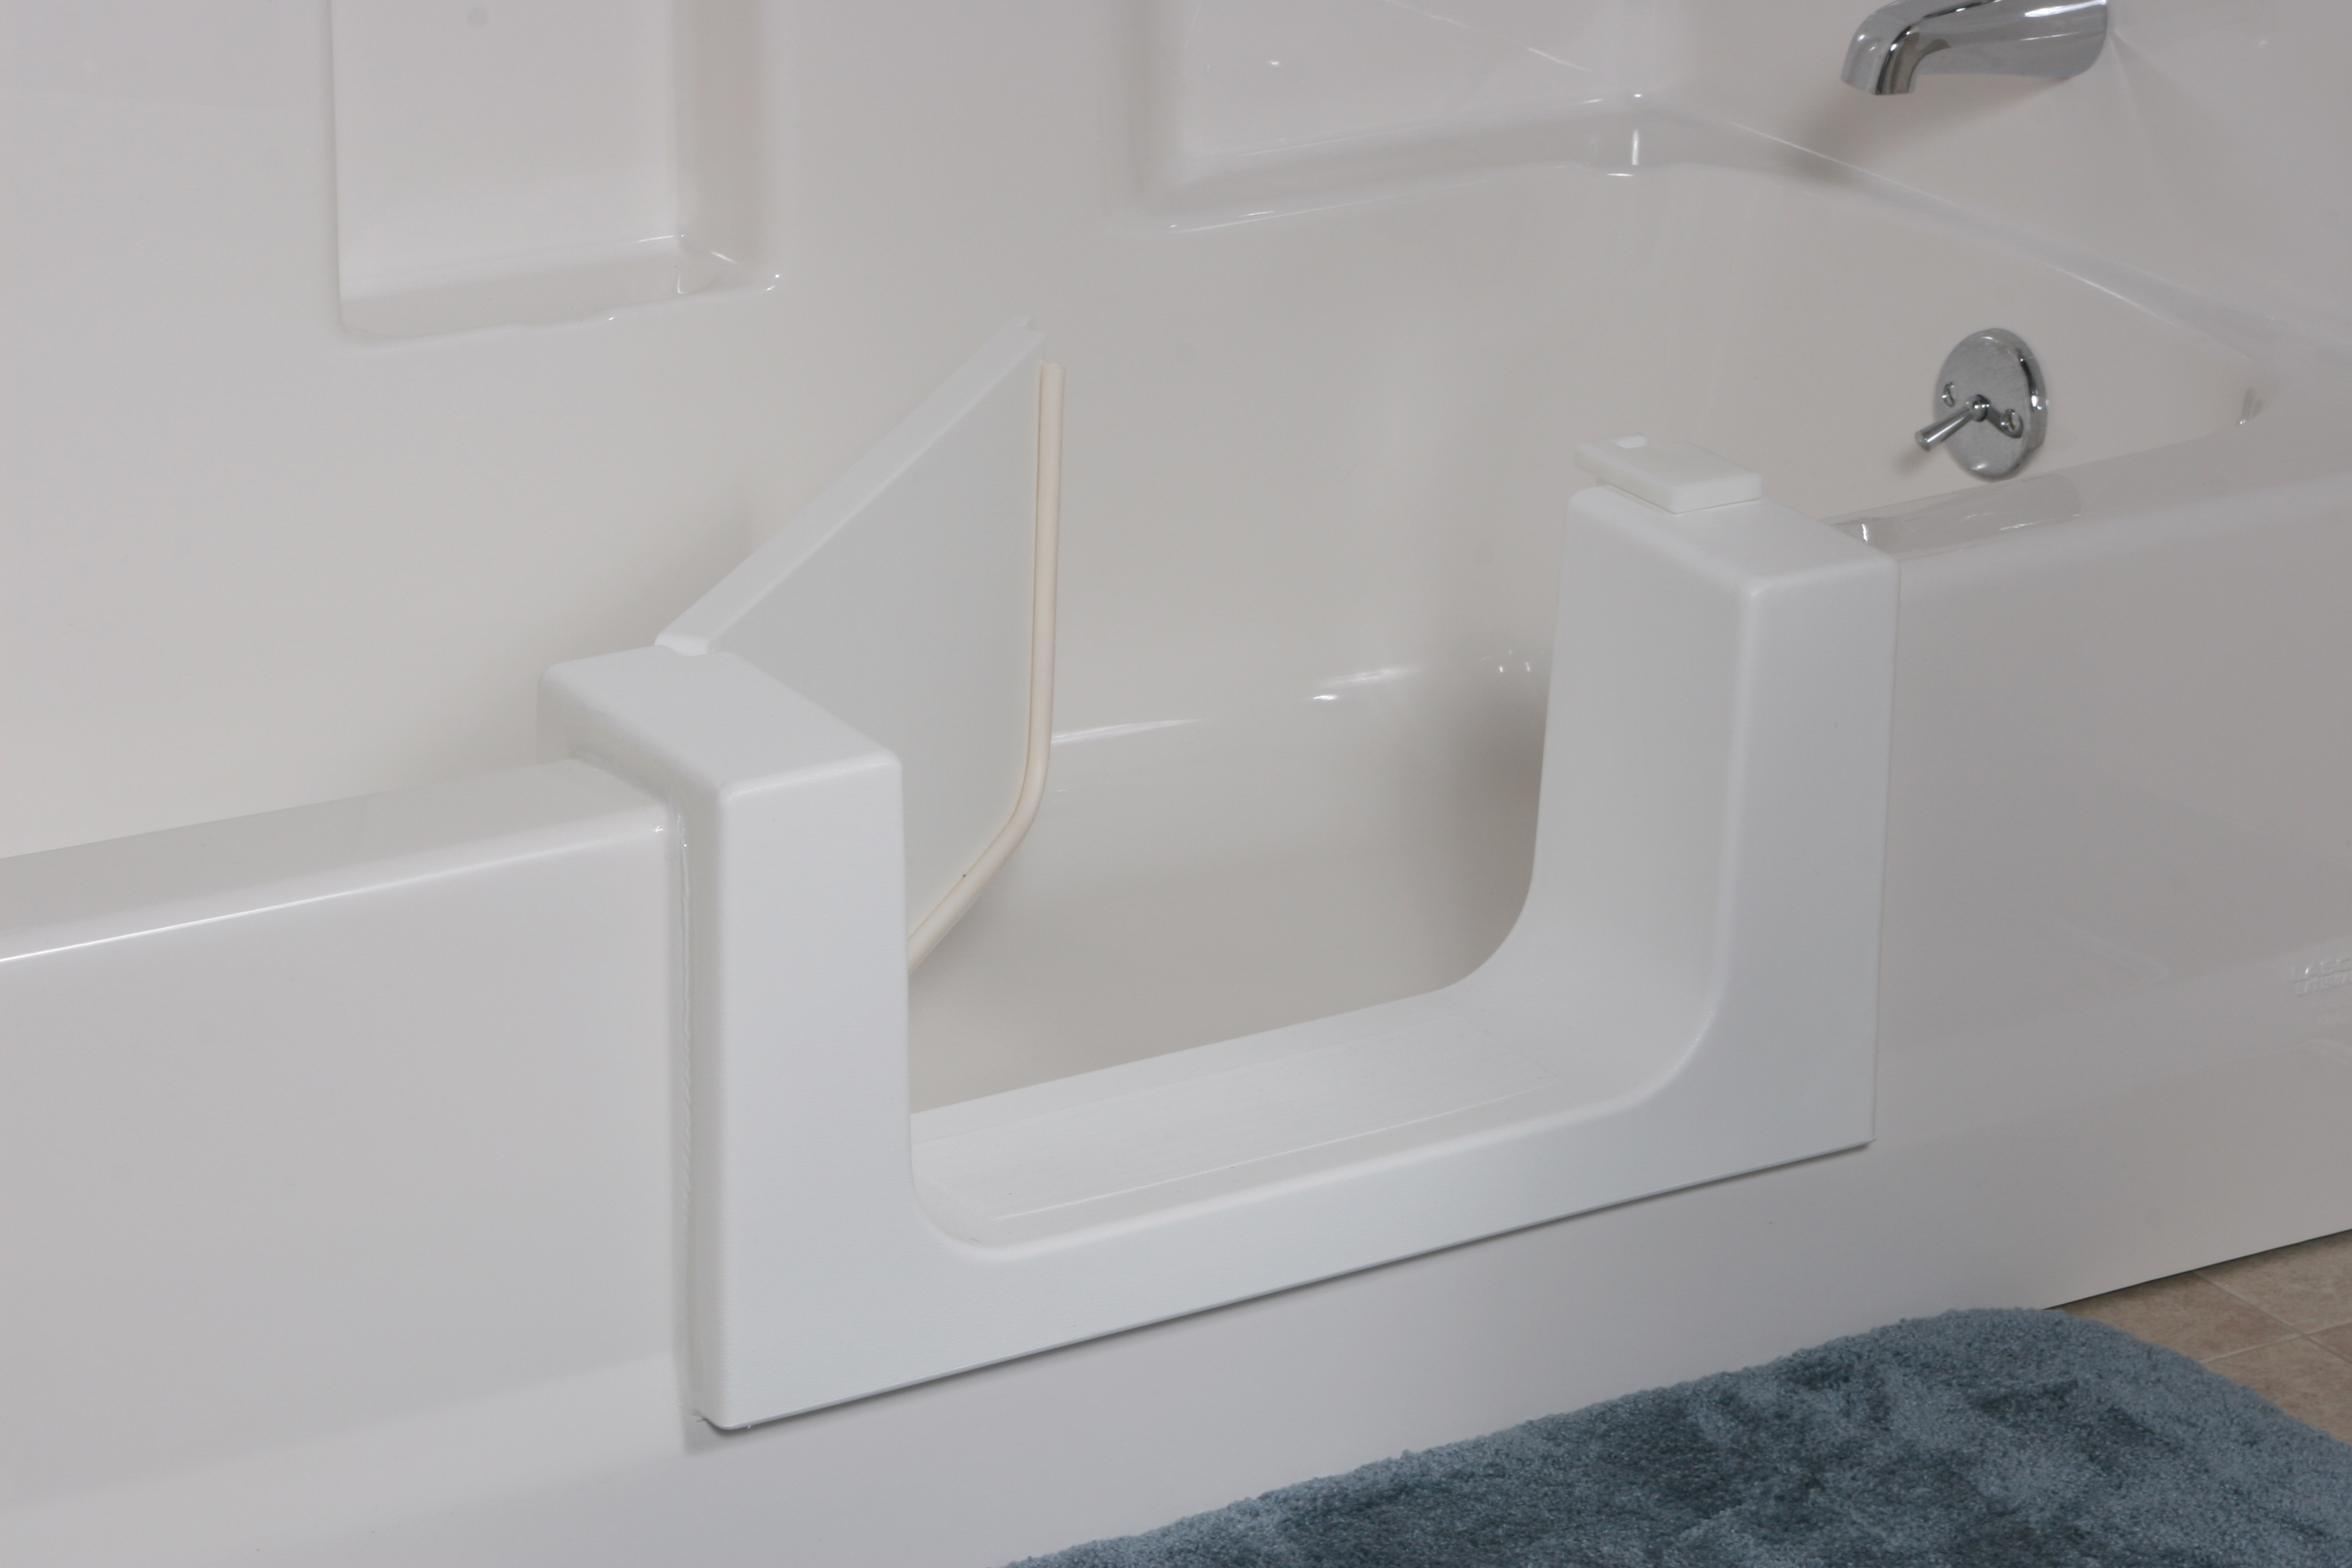 Safeway Tub Door Amp Safeway Step Provide Low Cost Aging